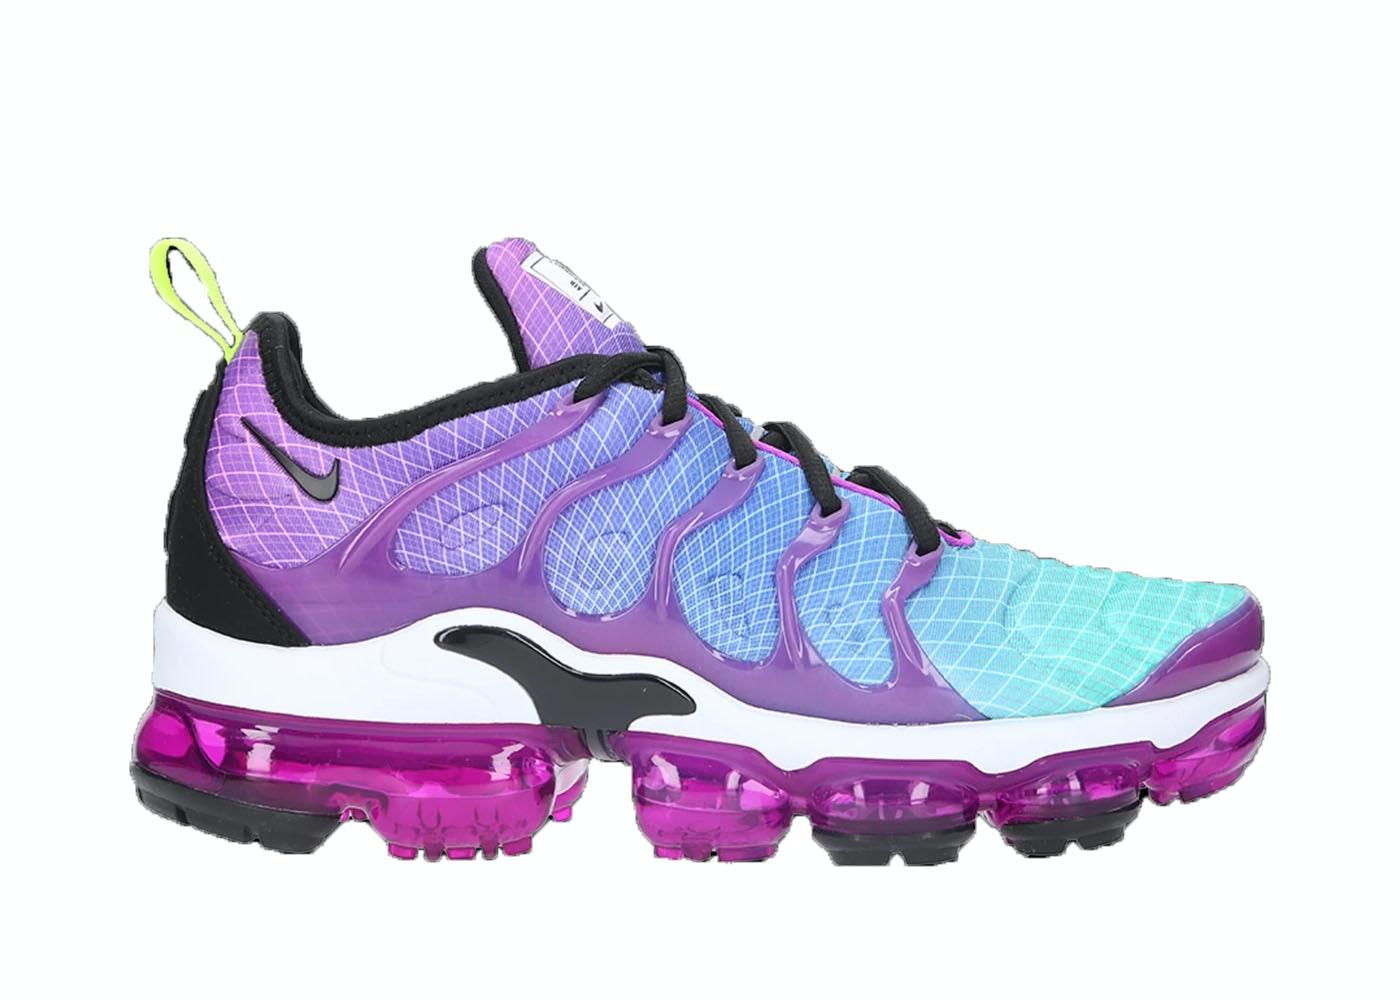 Relajante Revelar caloría  Nike Air VaporMax Plus Trainer Black White Footasylum